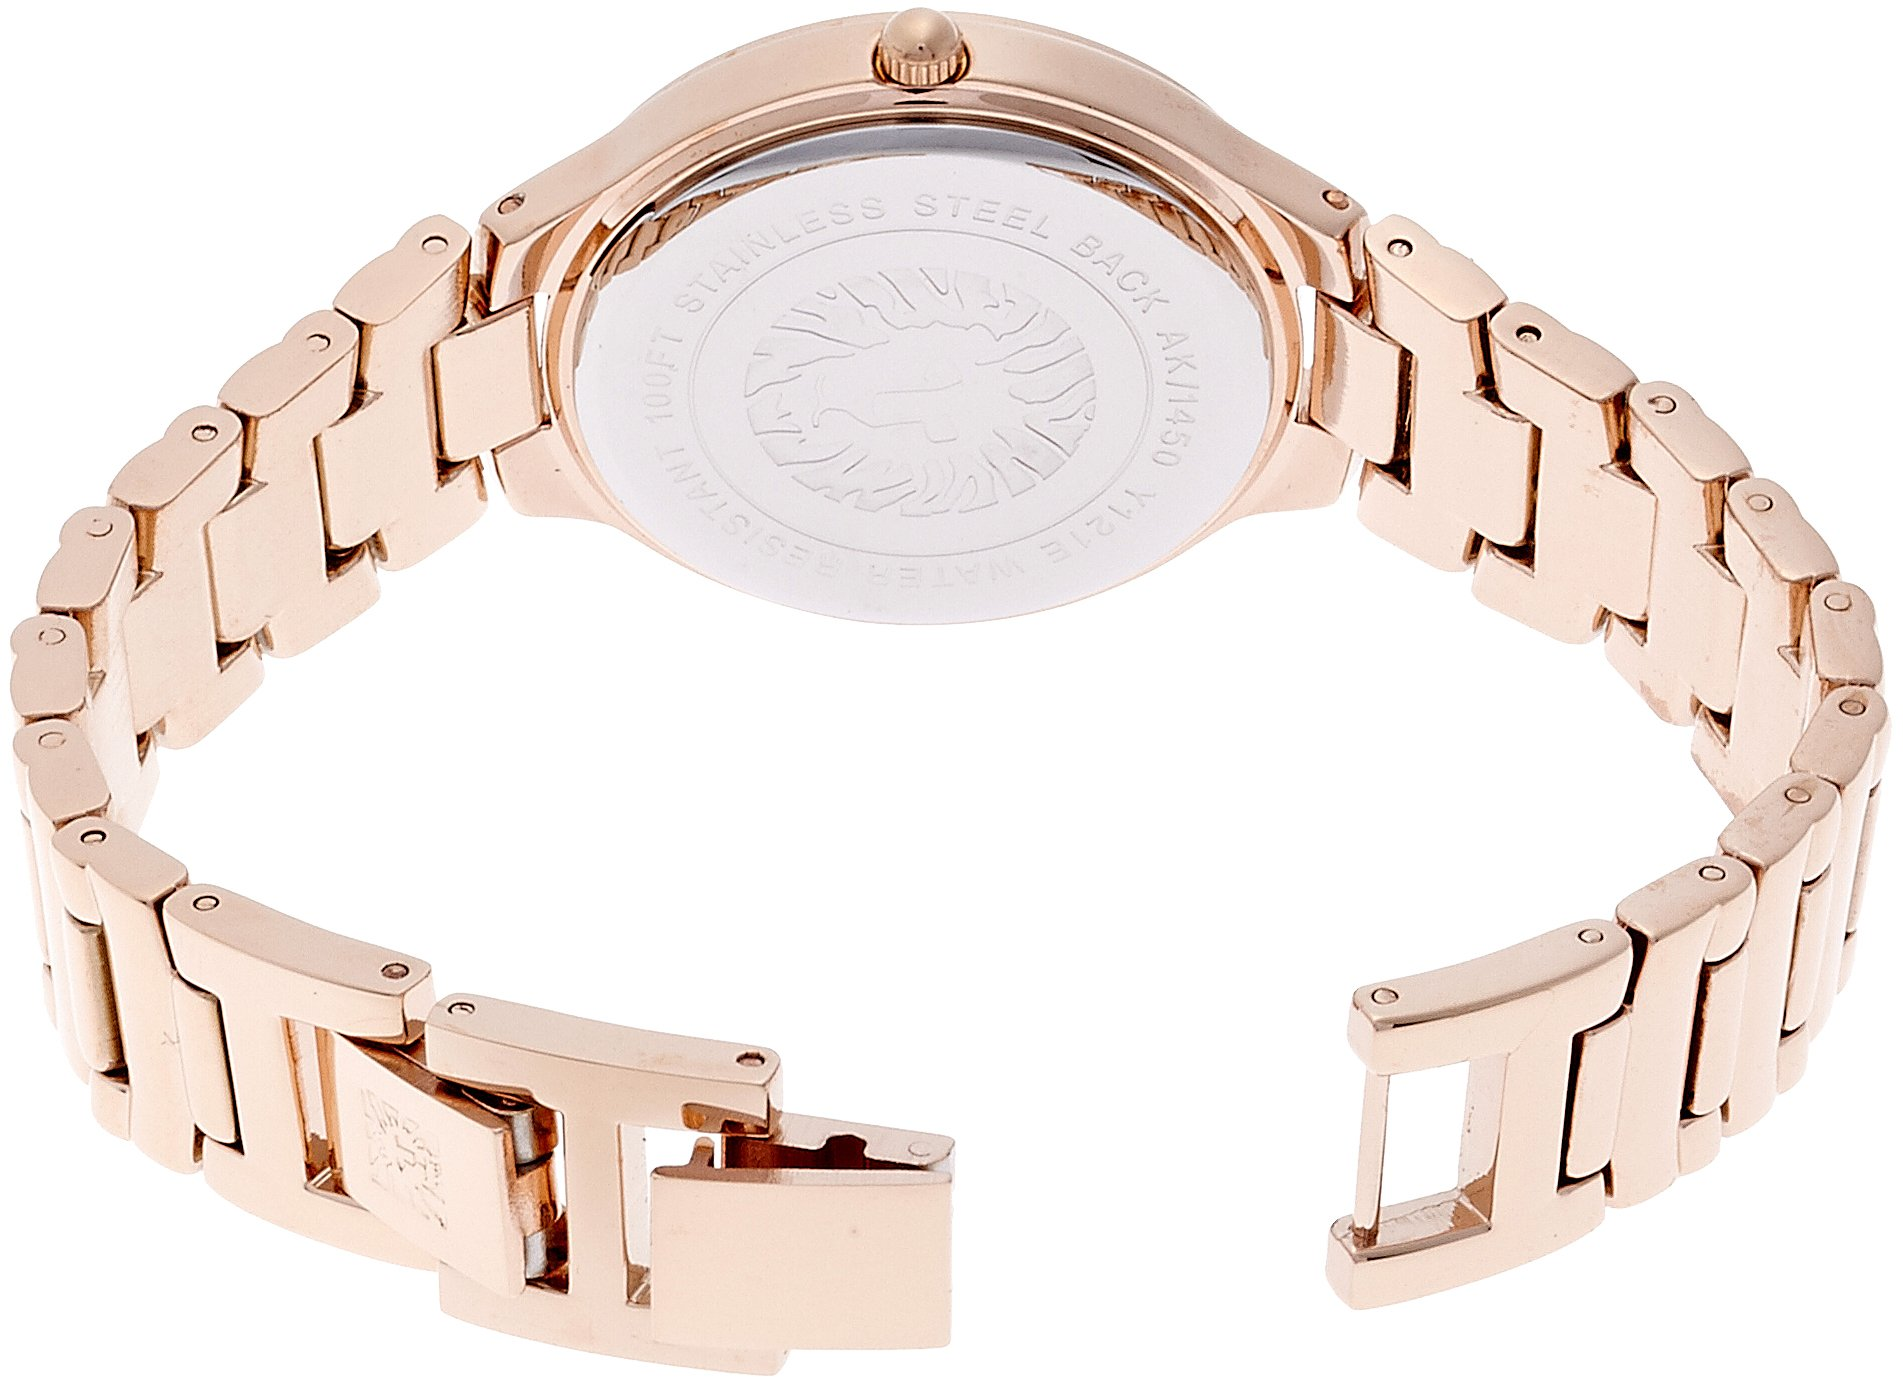 Anne Klein Women's AK/1450RGRG Rose Gold Tone Bracelet Watch by Anne Klein (Image #2)